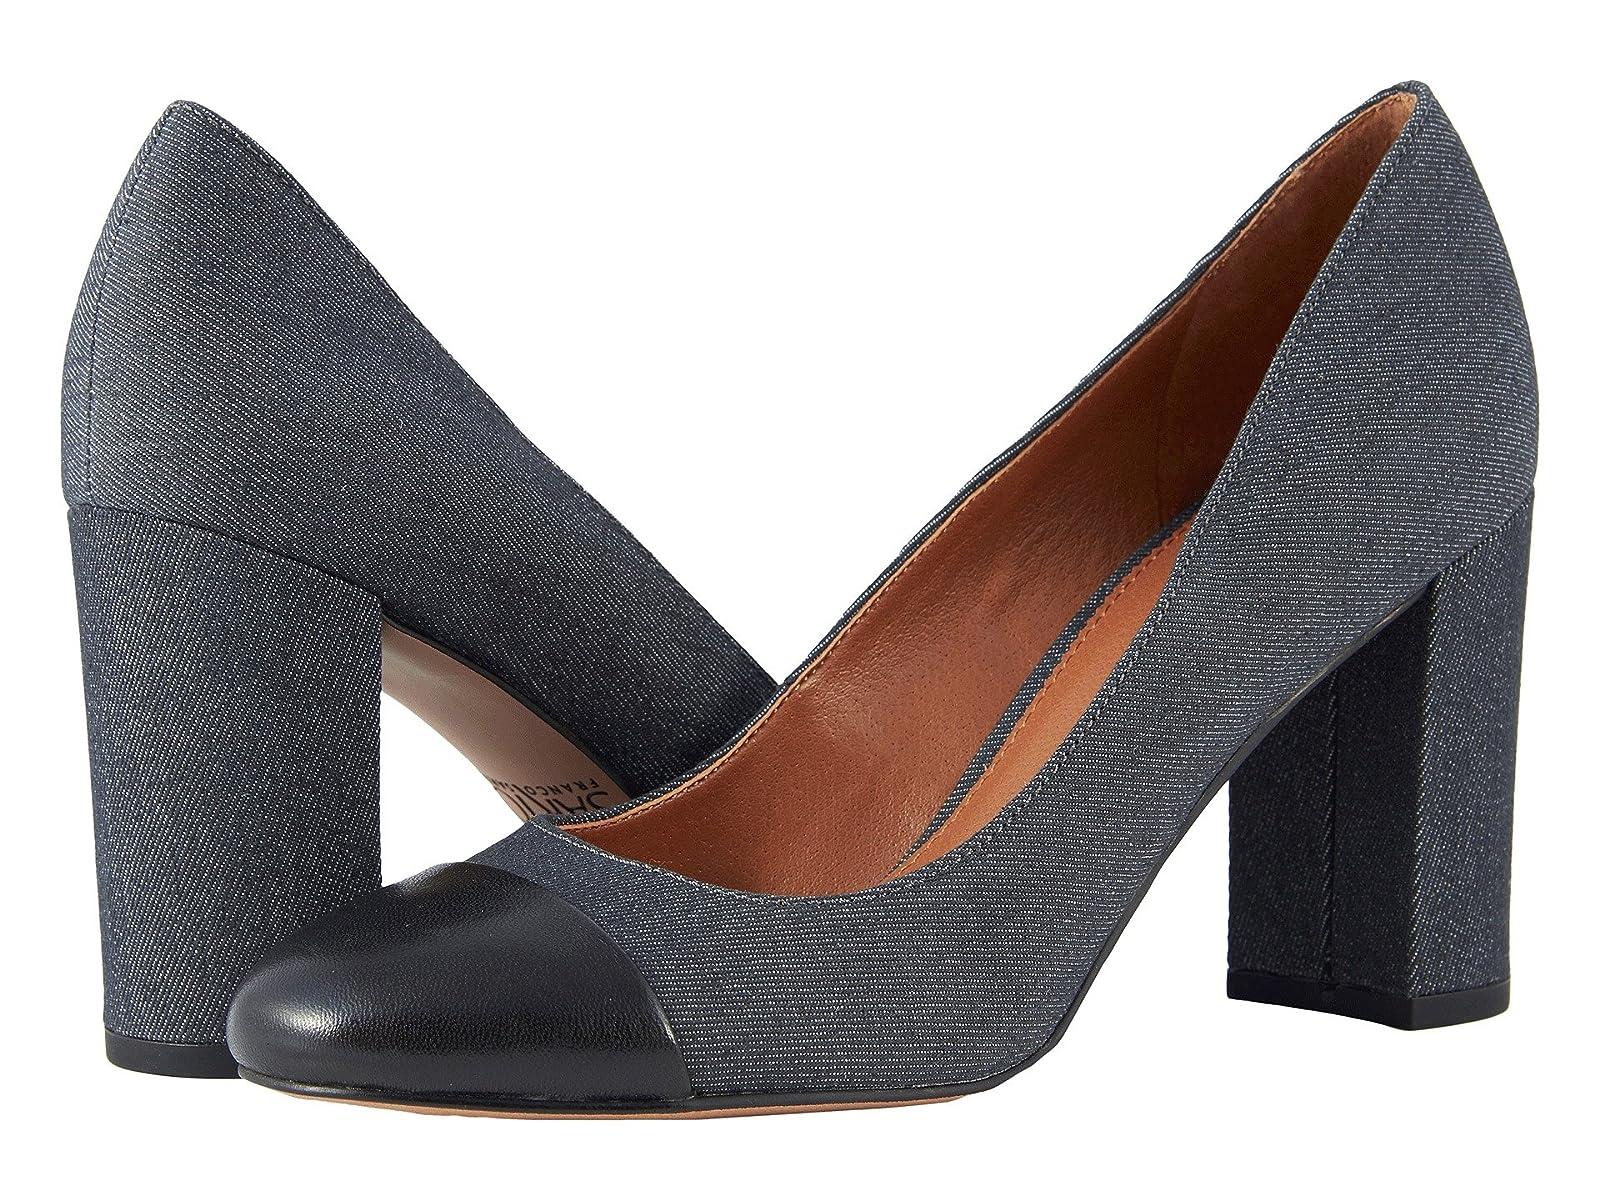 Franco Sarto Astrella by SARTOCheap and distinctive eye-catching shoes